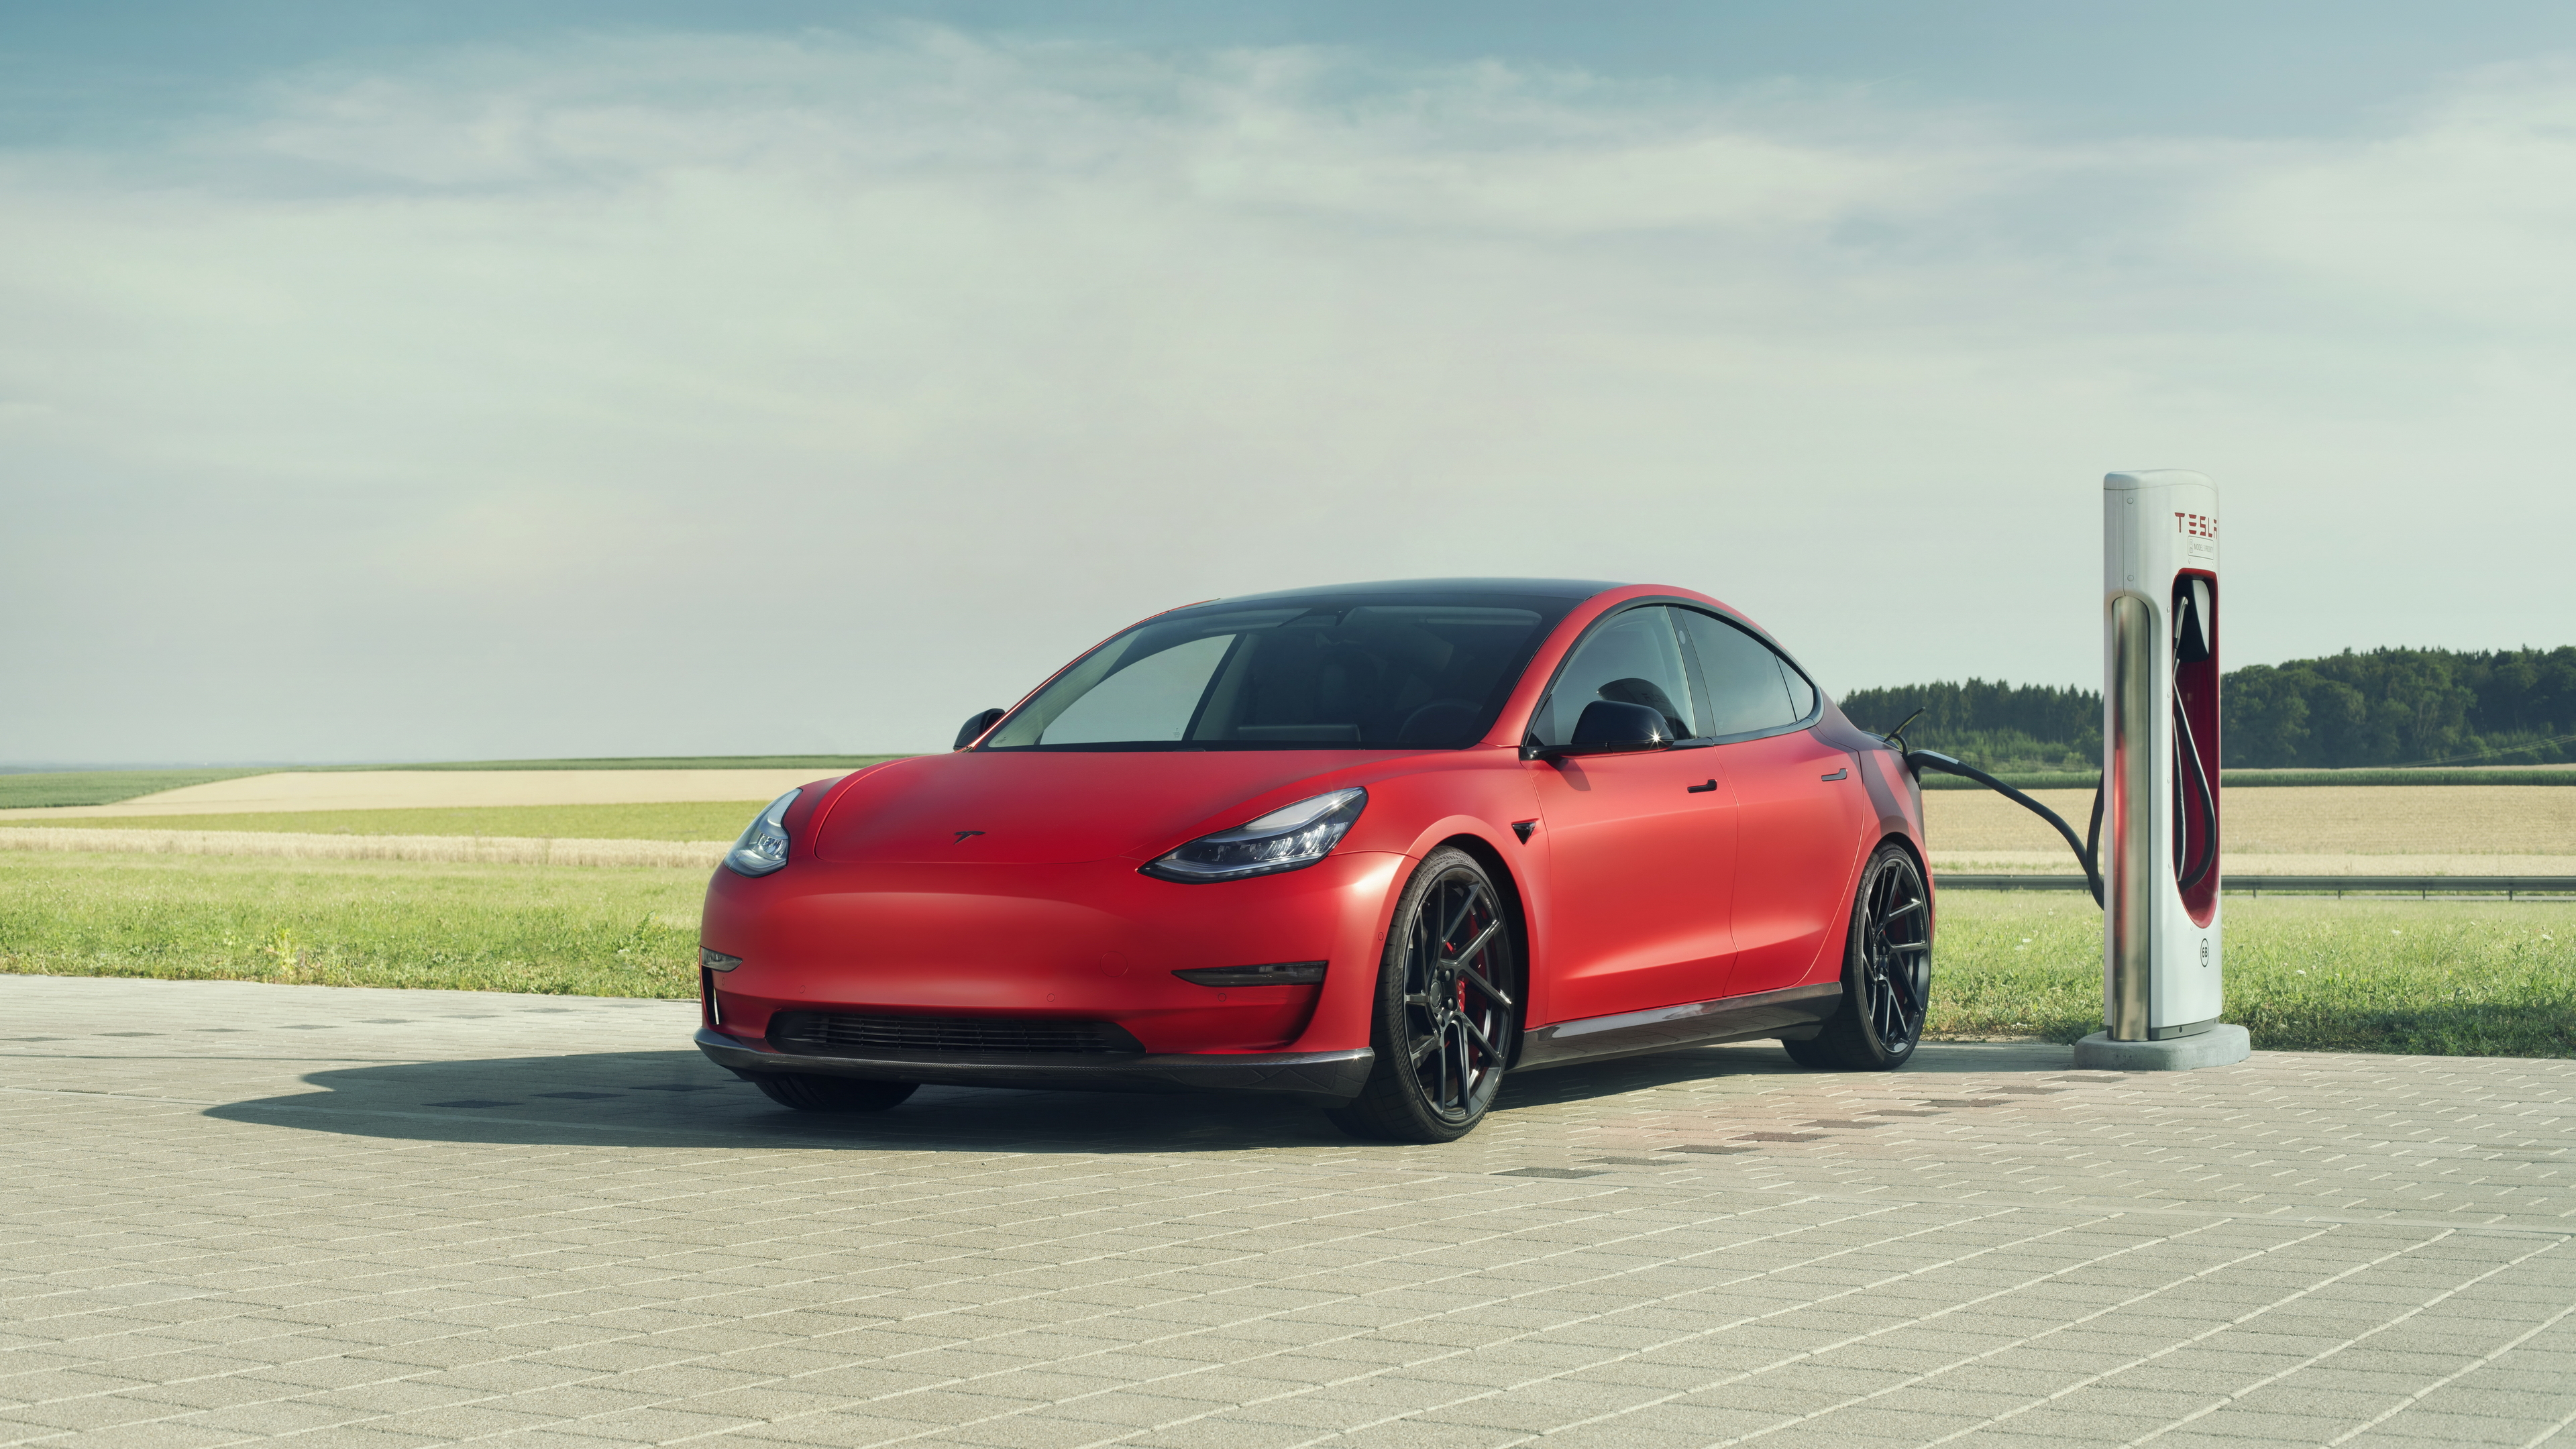 novitec tesla model 3 2019 charging 1569188574 - Novitec Tesla Model 3 2019 Charging - tesla wallpapers, tesla model 3 wallpapers, hd-wallpapers, cars wallpapers, 4k-wallpapers, 2019 cars wallpapers